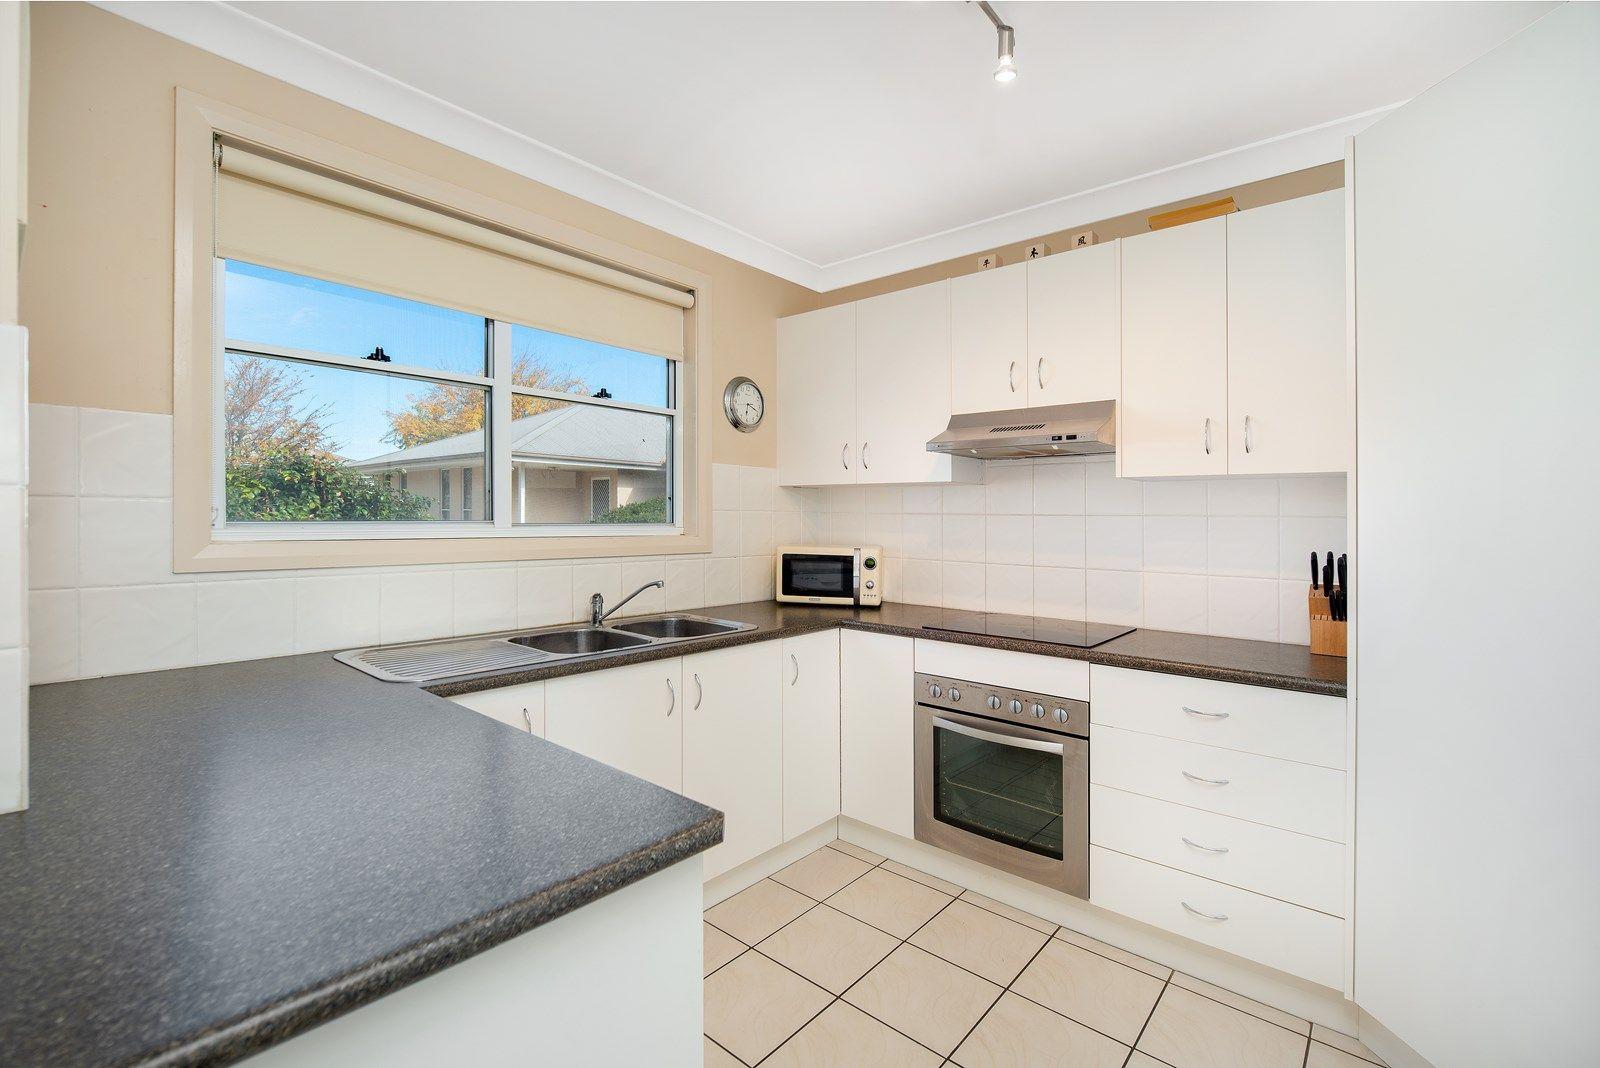 11/61 Lewis Street, Mudgee NSW 2850, Image 1